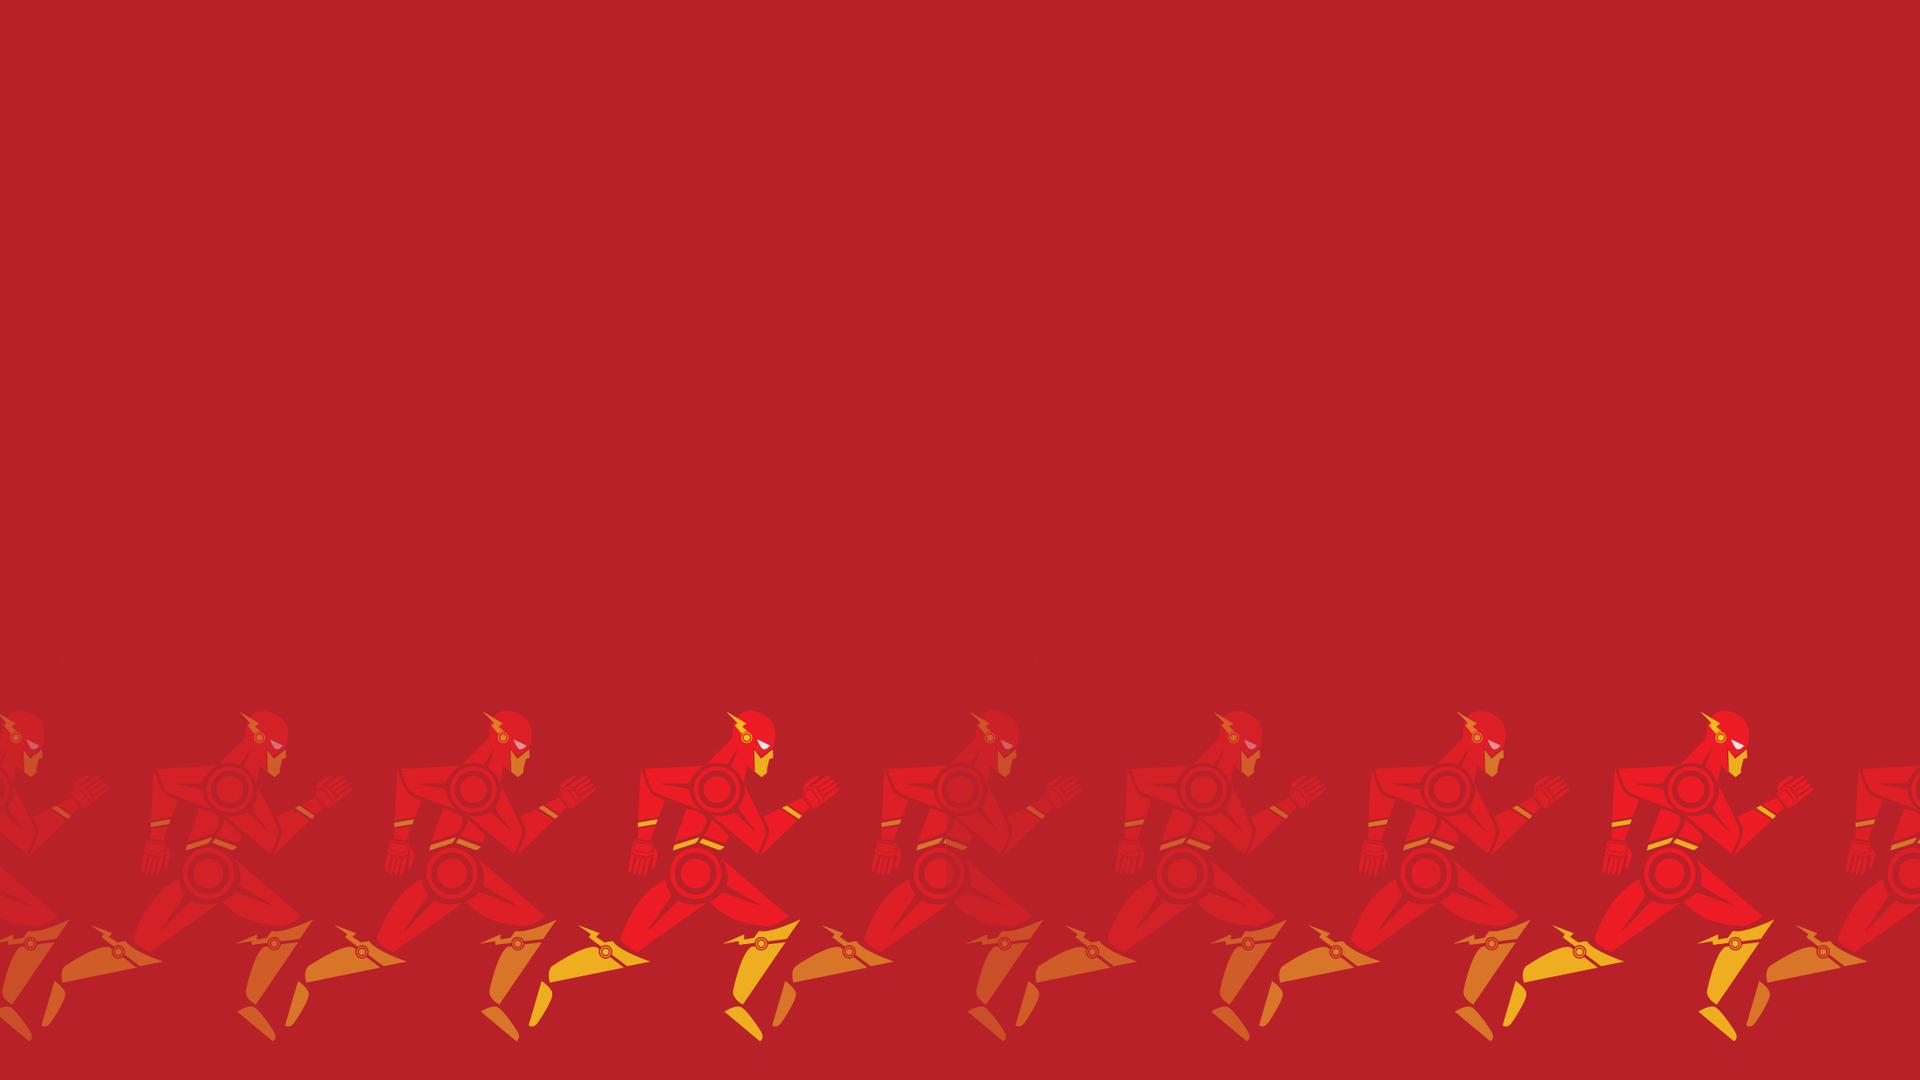 Flash Computer Wallpapers Desktop Backgrounds 1920x1080 ID493121 1920x1080